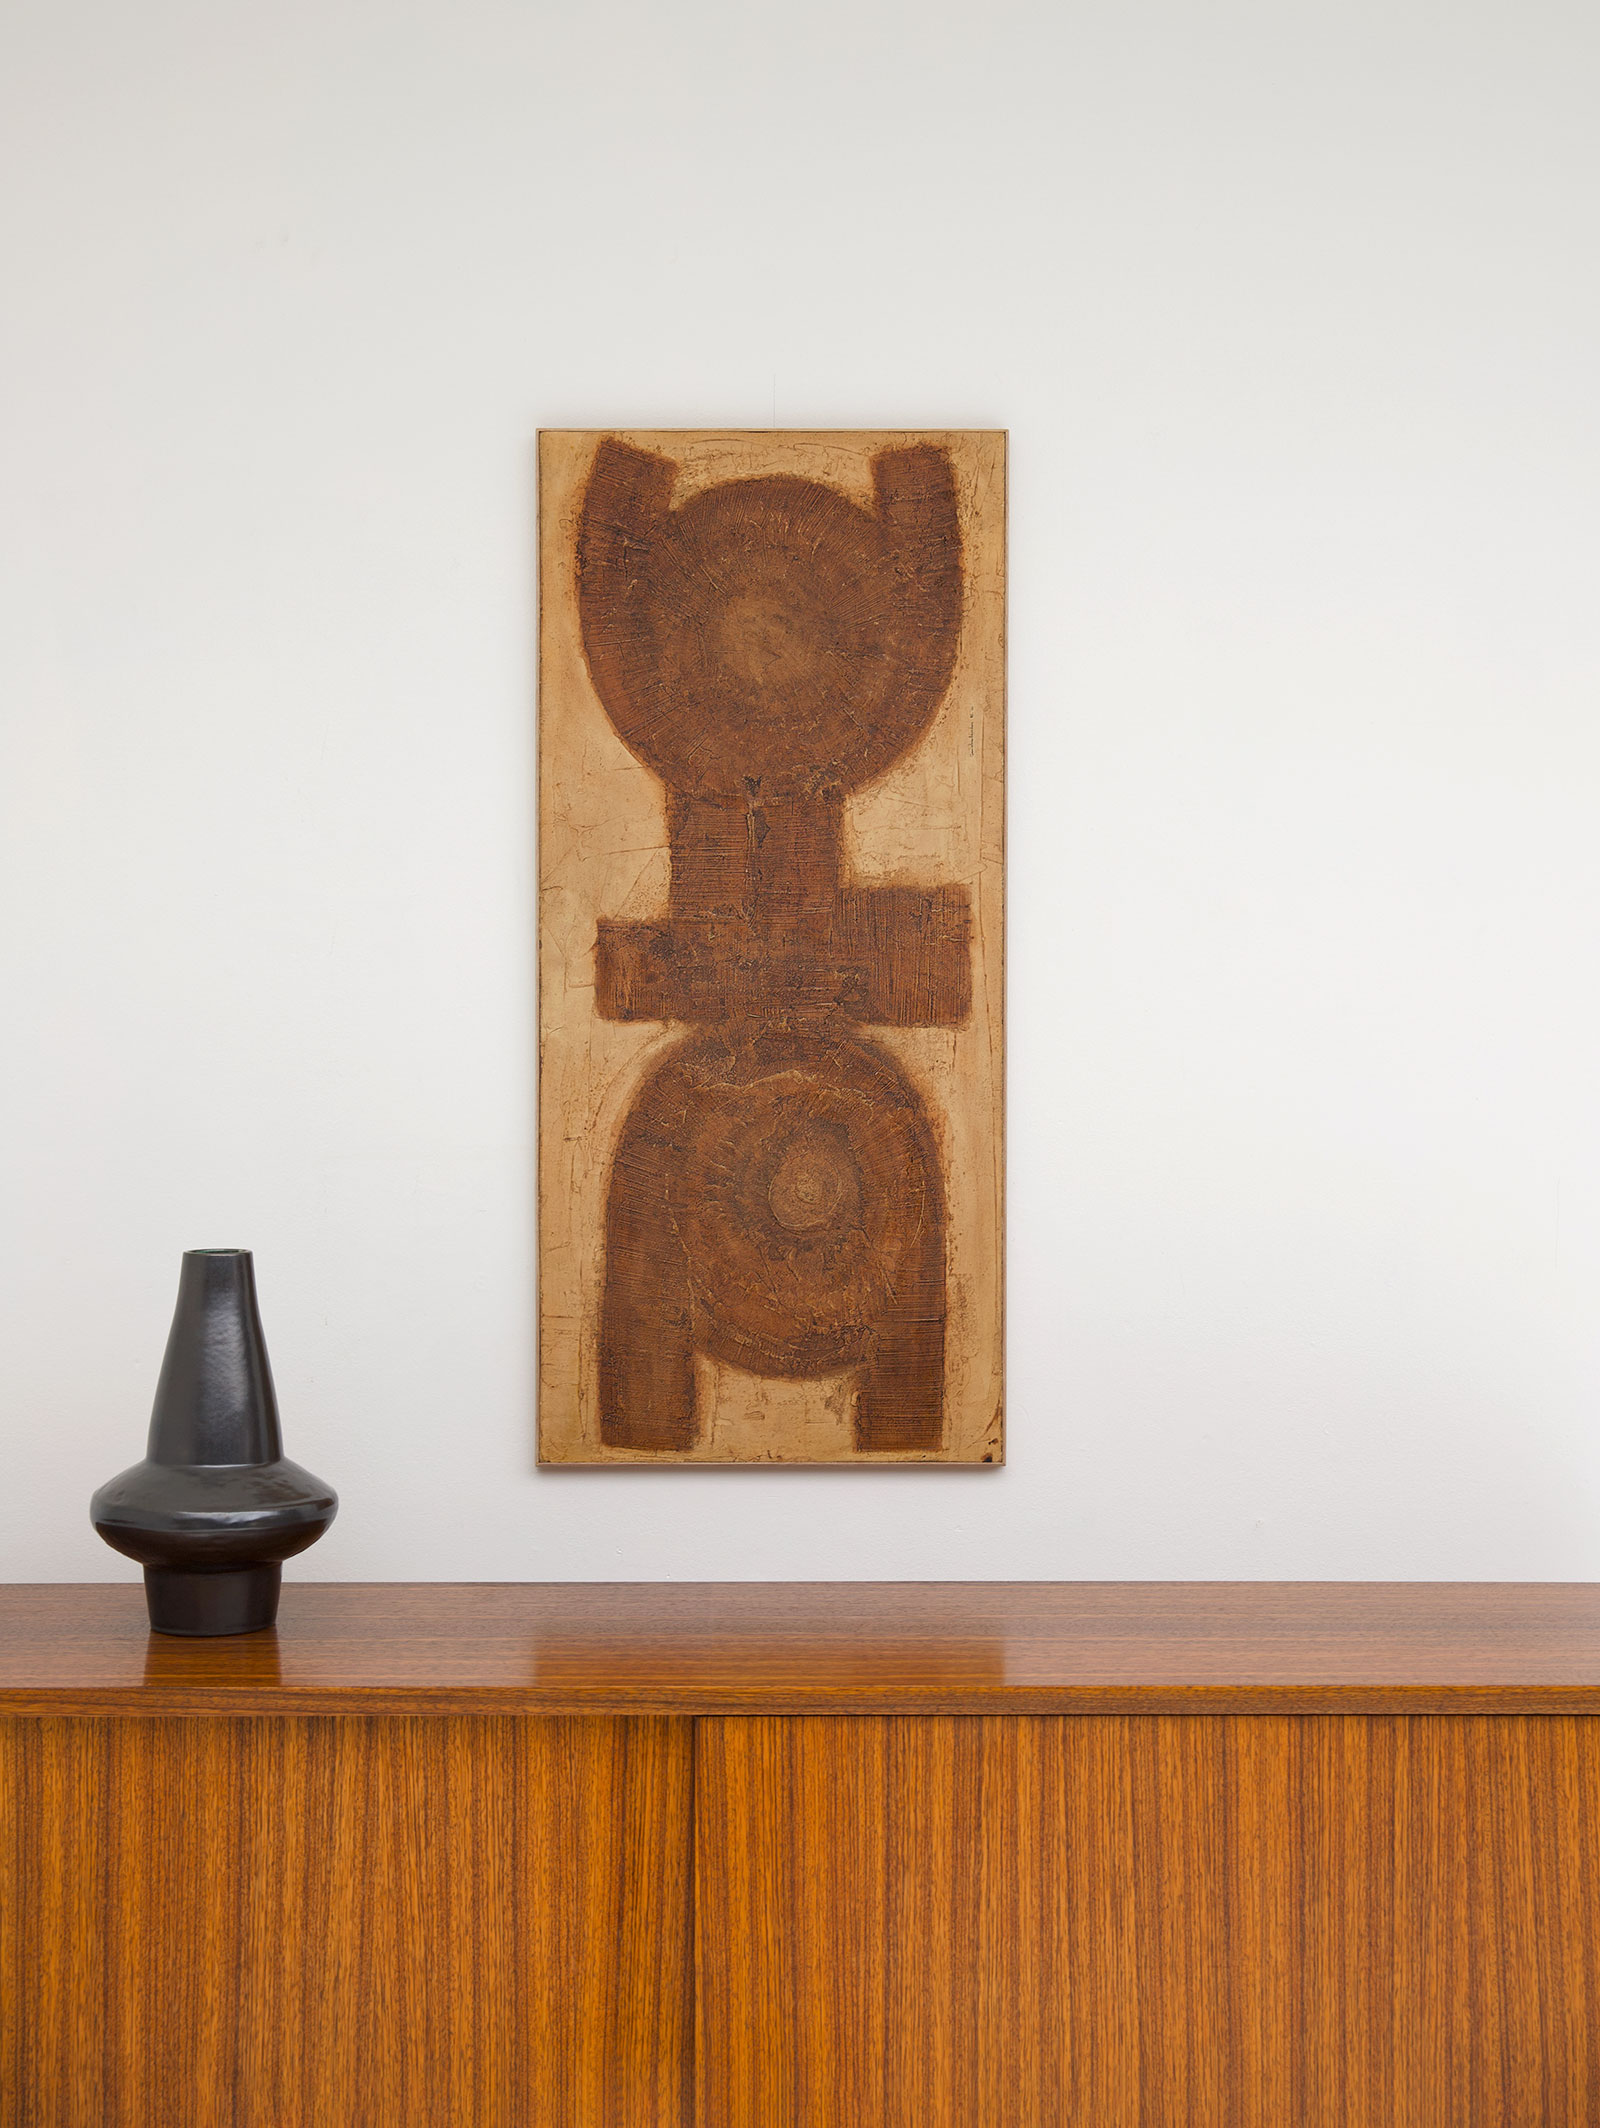 camiel van breedam 1960 artwork